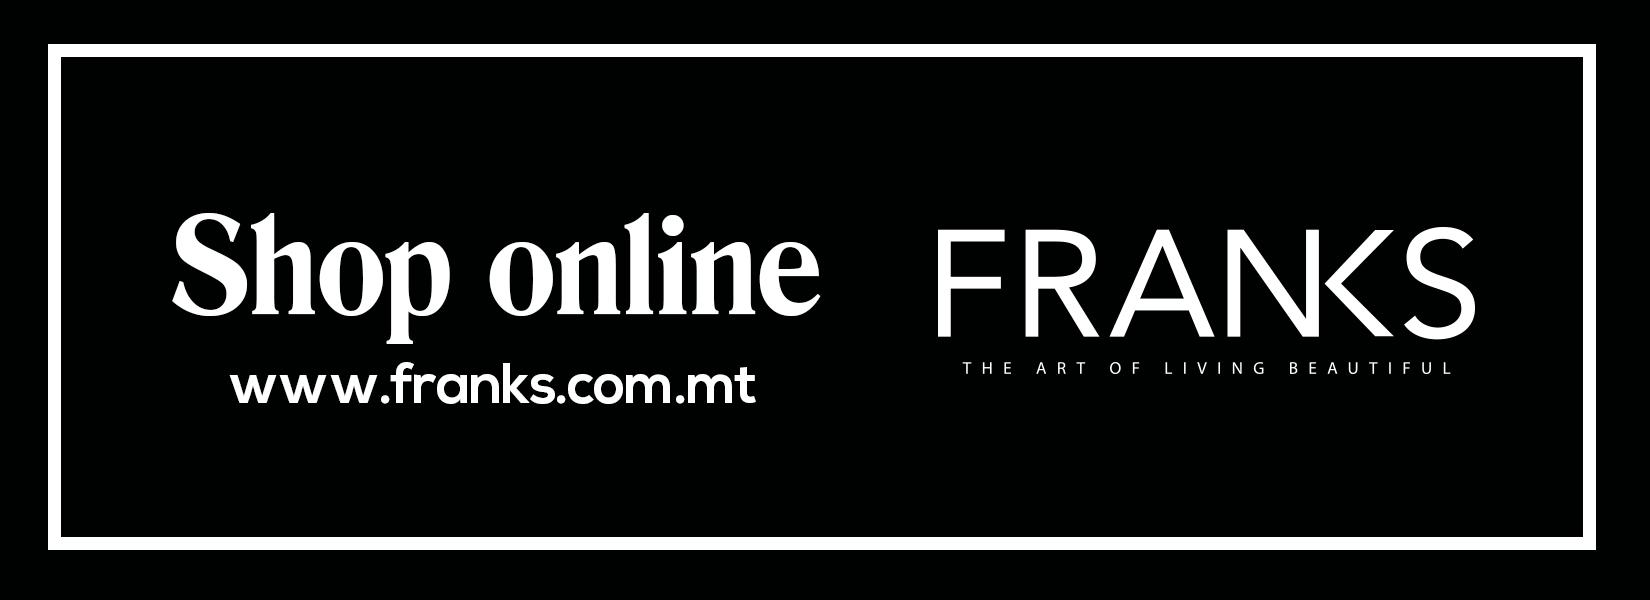 FRANKS Online